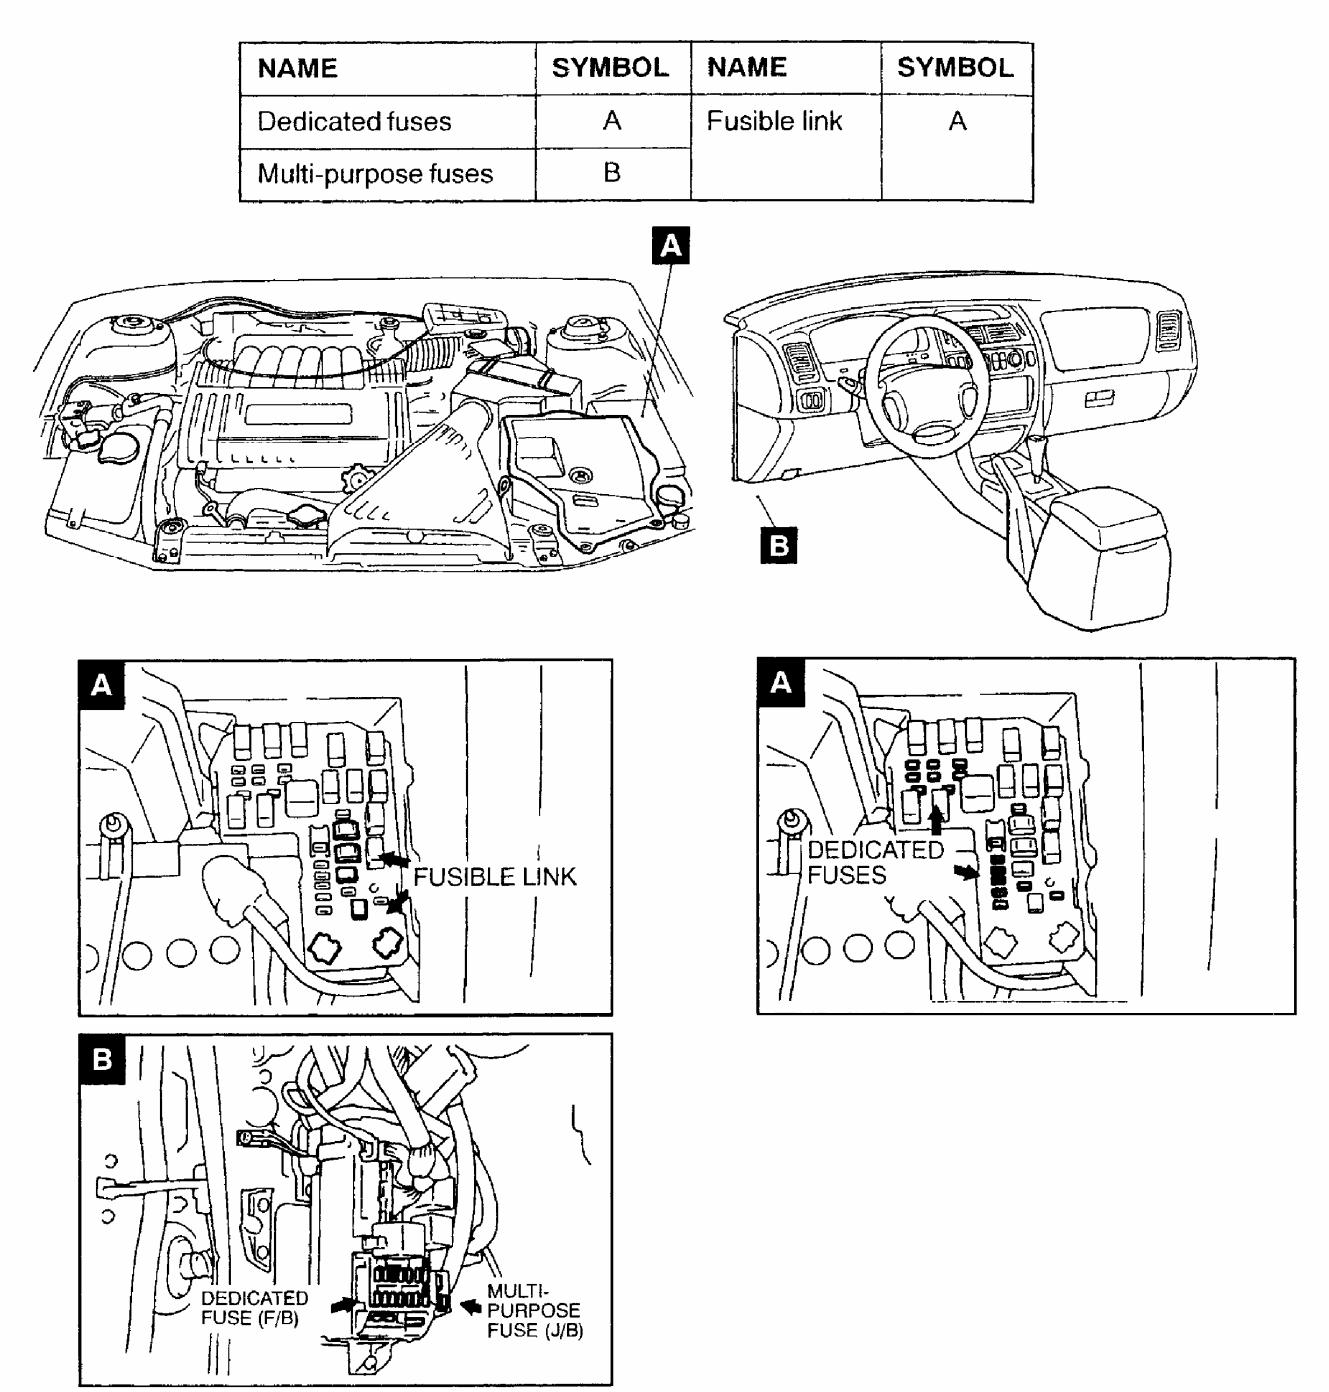 75FB4 01 Mitsubishi Diamante Fuse Box | Wiring Diagram Library Wiring Diagram Library